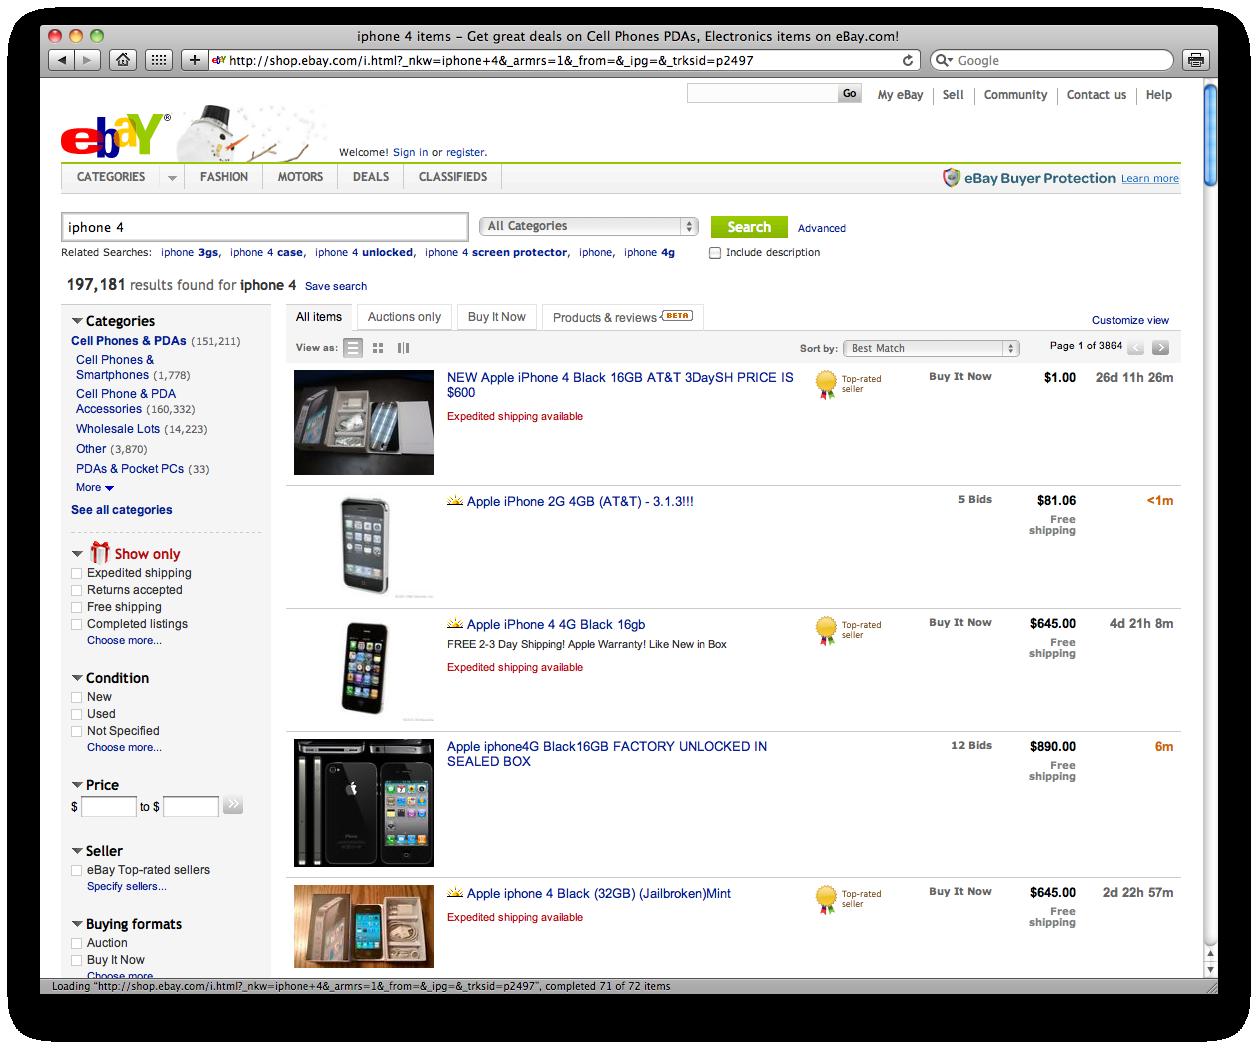 iPhone 4 no eBay